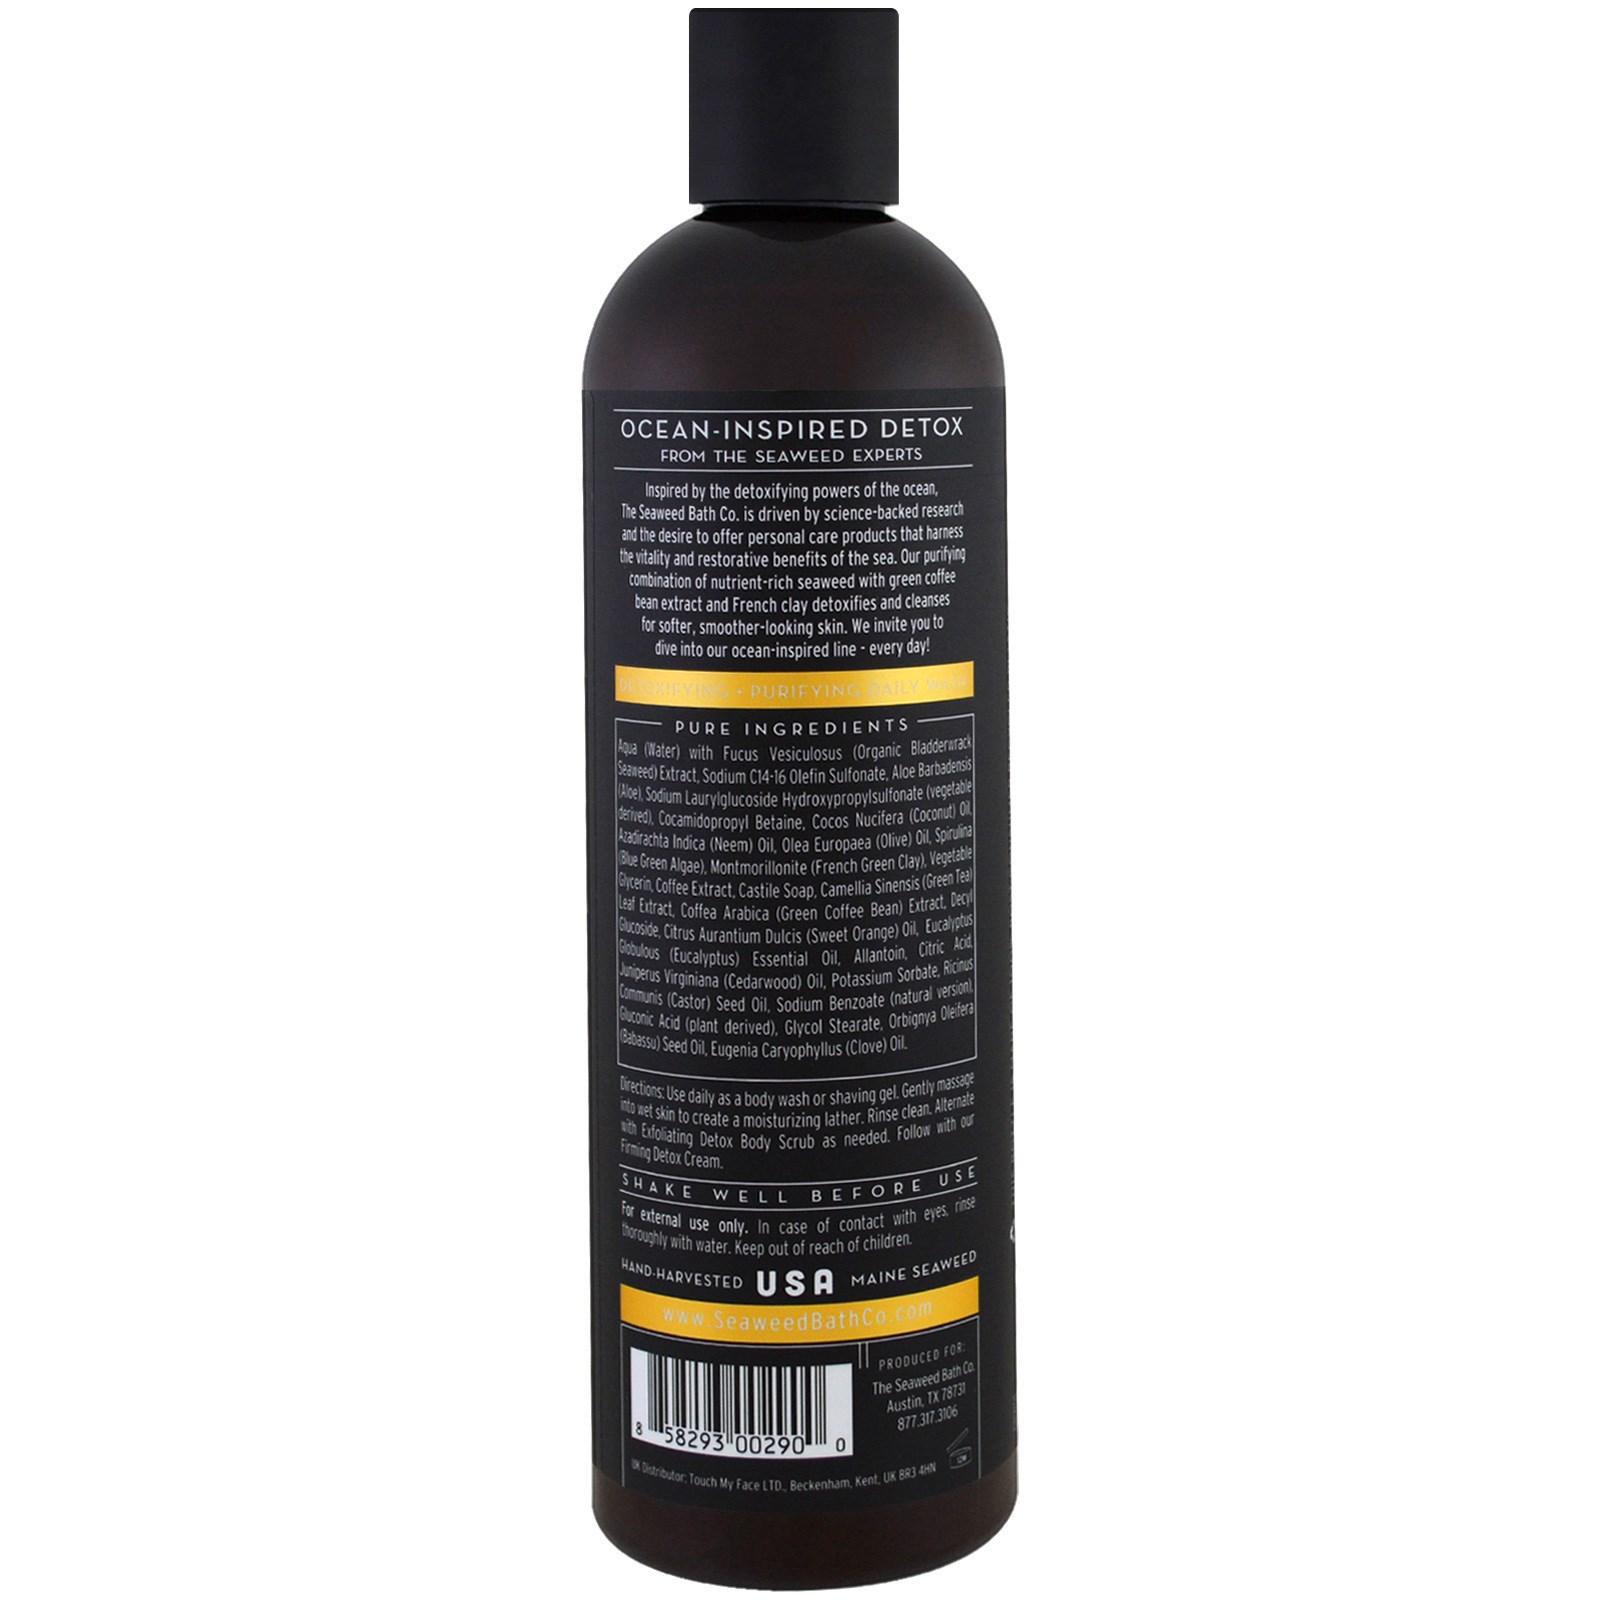 Seaweed Bath Co., Exfoliating Detox Scrub, Refresh, Orange, Eucalyptus & Cedar, 6 fl oz(pack of 2) Cowshed - Palmarosa Revitalising Face Mask - 50ml/1.69oz